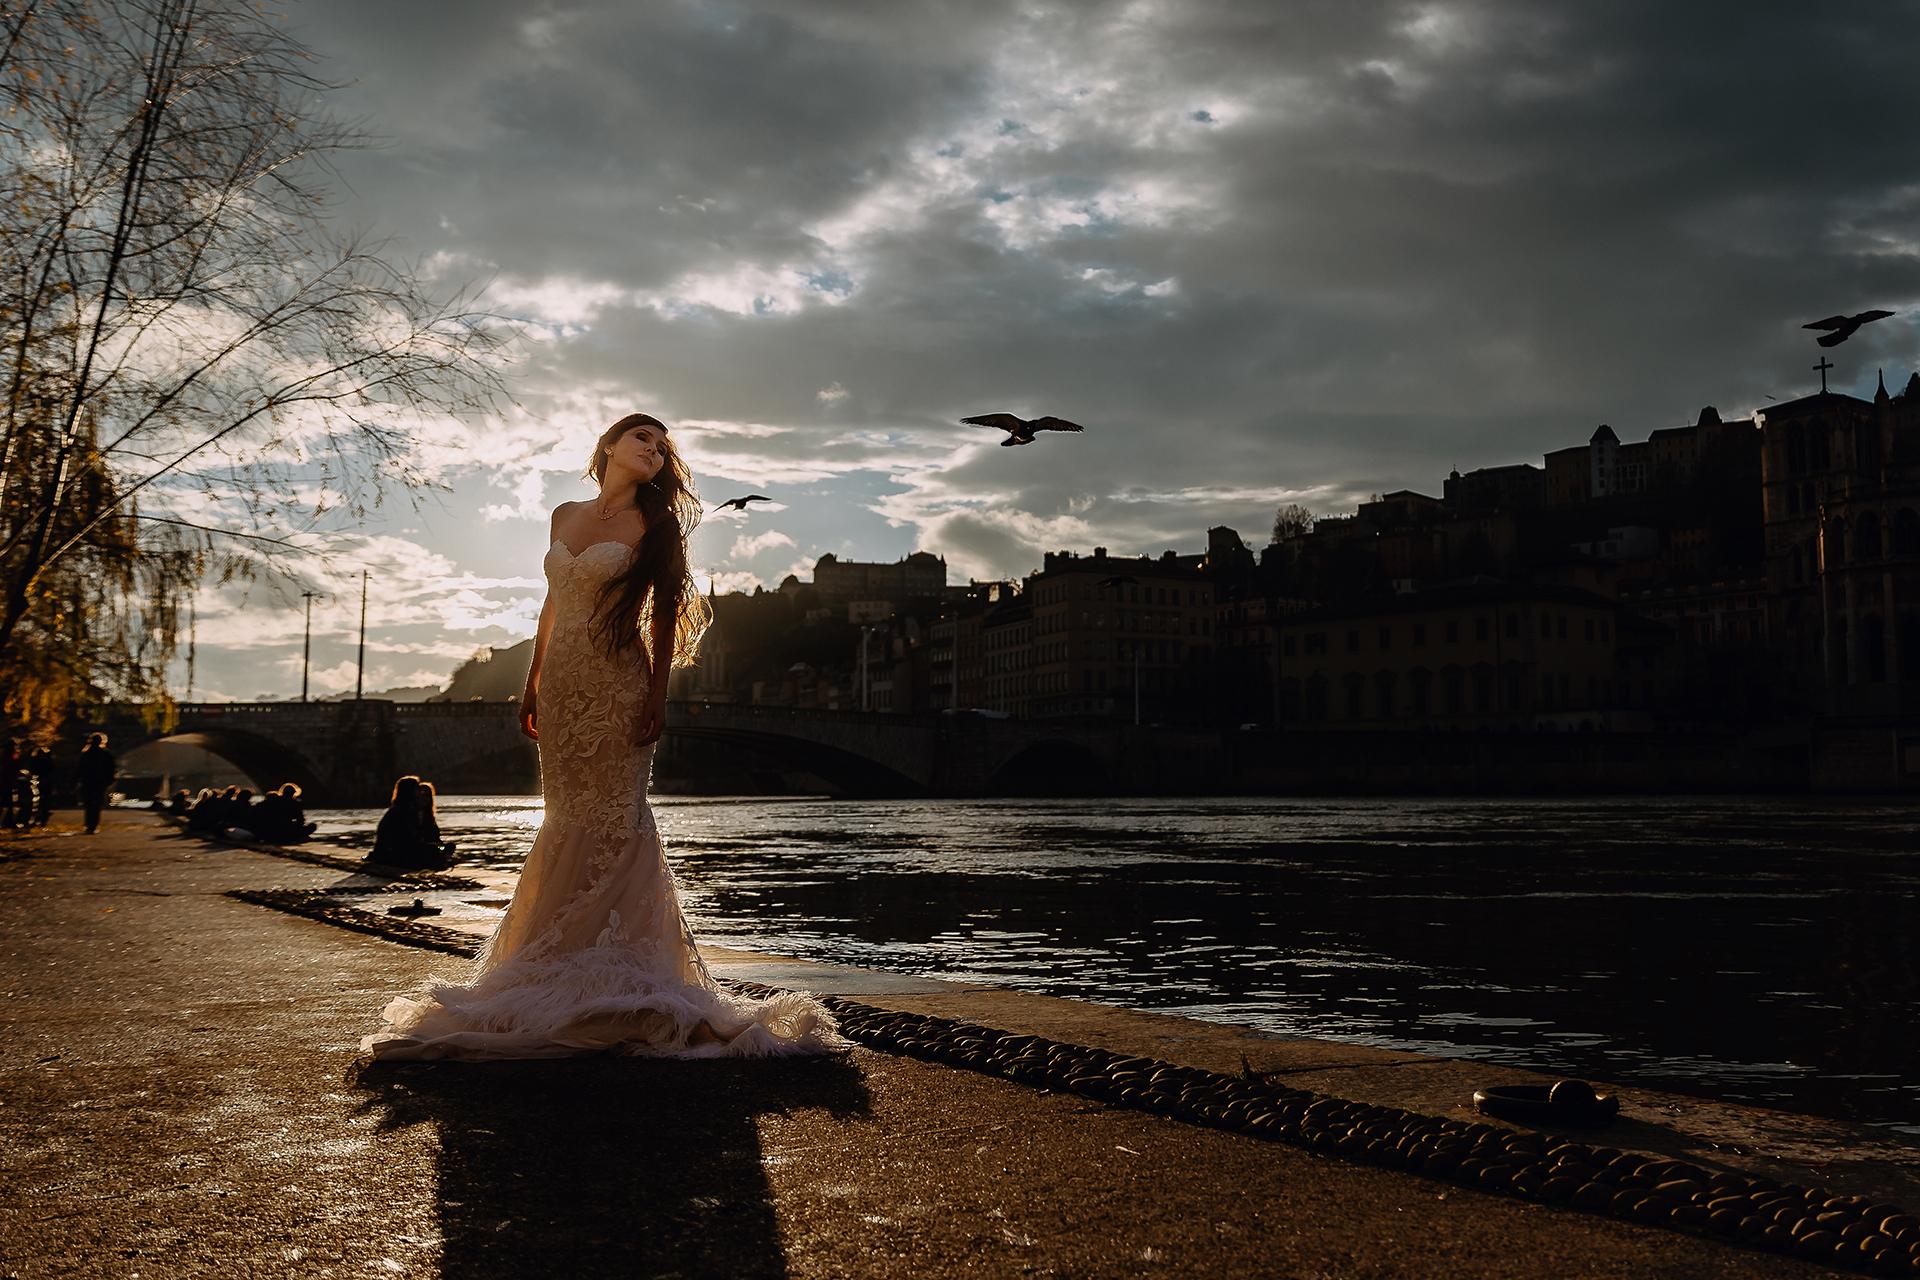 Quai de Saône Bridal Portrait on Wedding Day | The light is beautiful for December